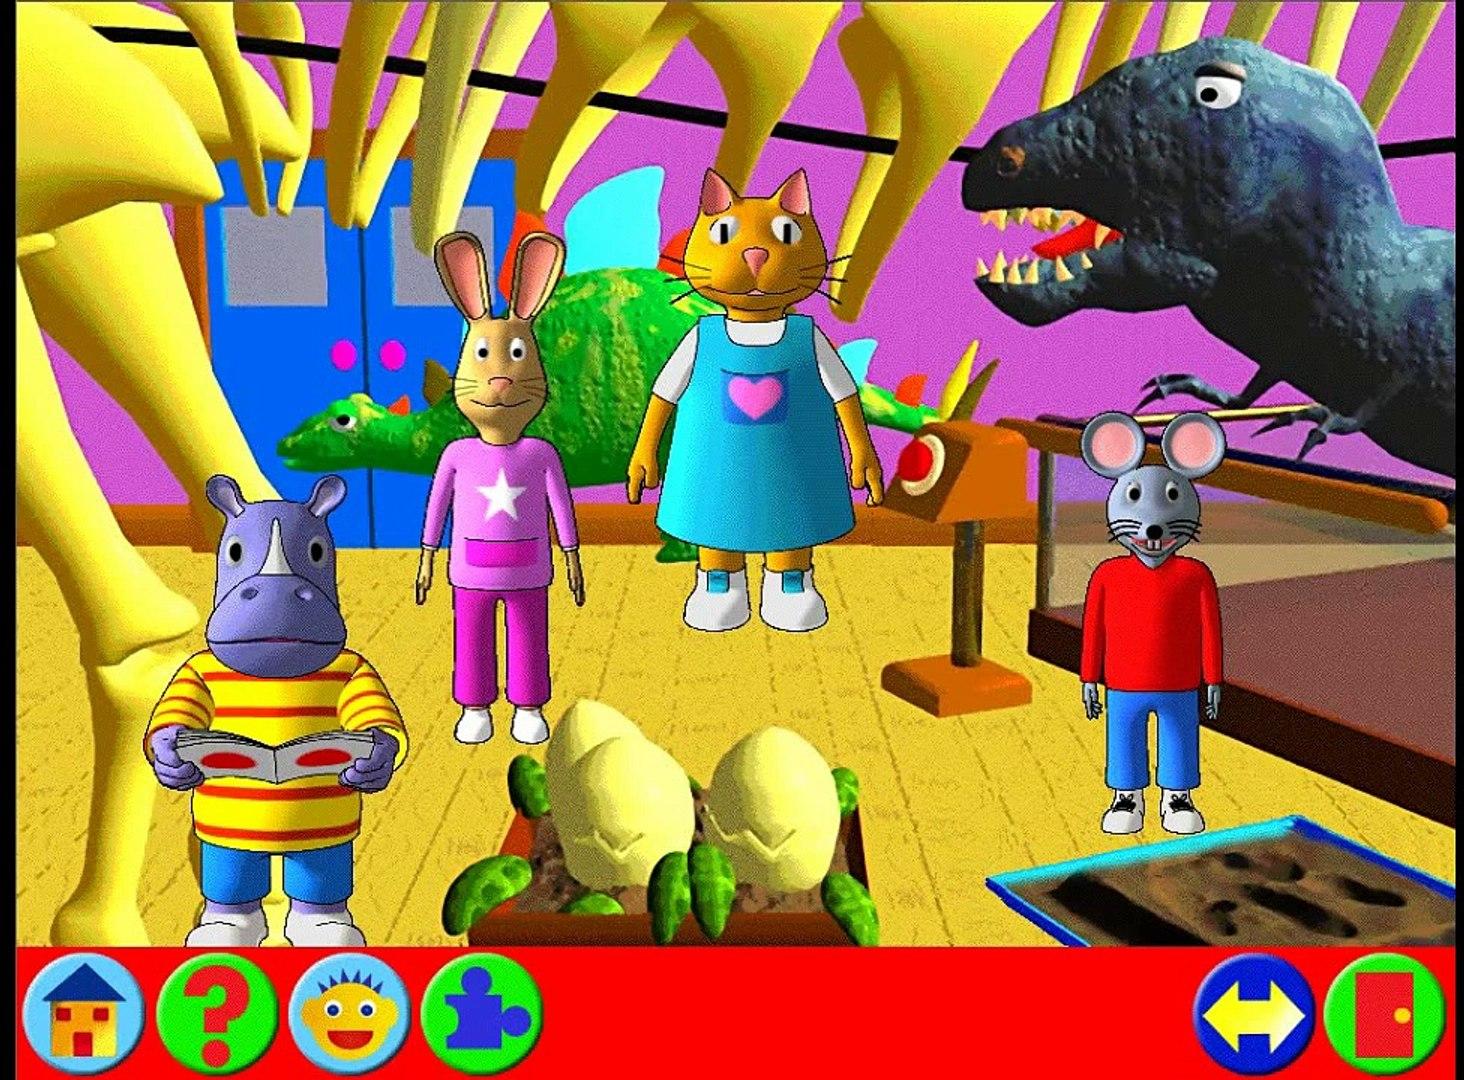 Страна знаний Де агостини - Встреча с динозаврами